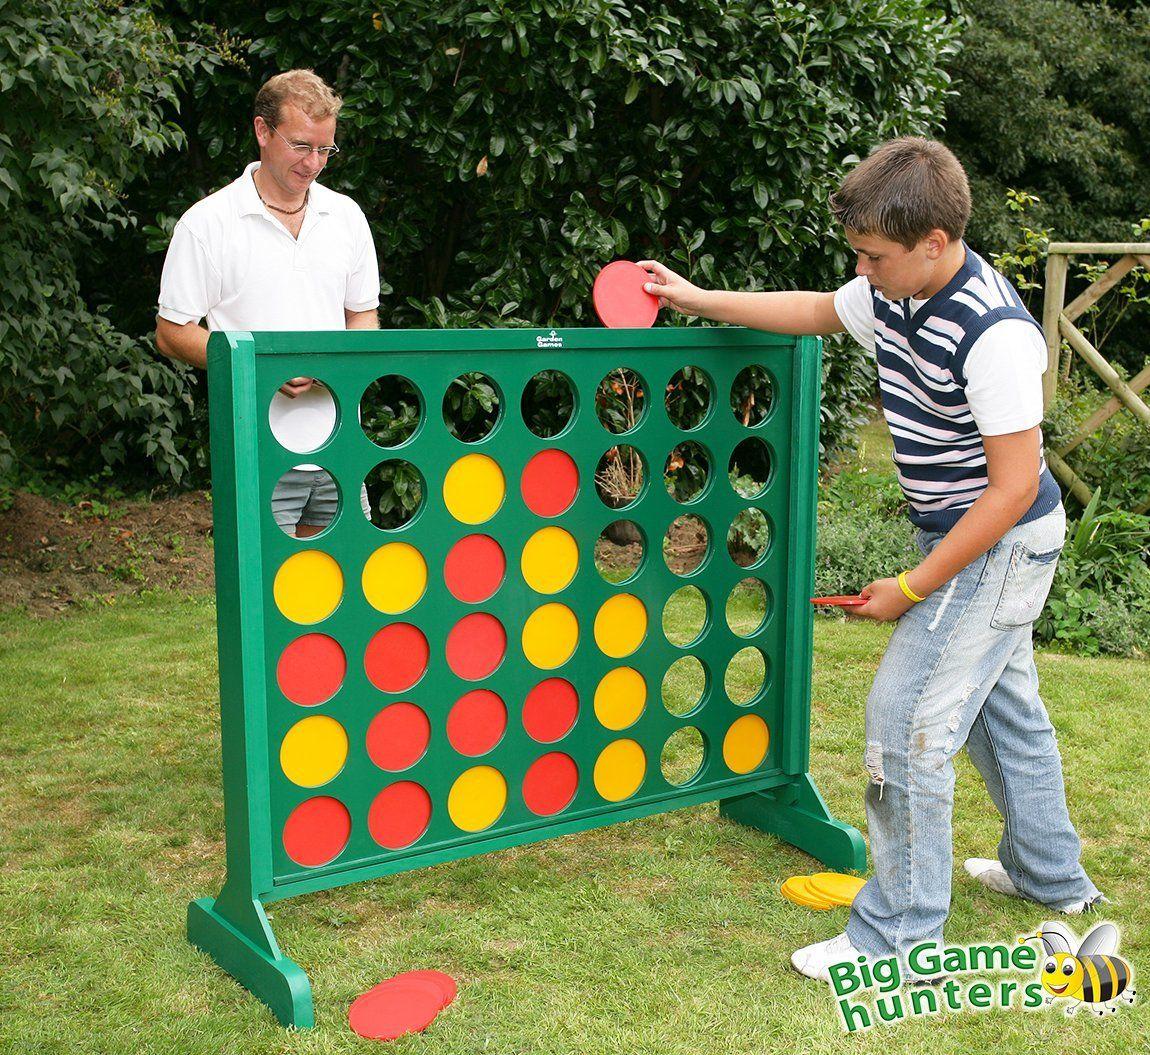 All Bounce Surrey Giant Connect 4 For Hire Www Allbouncesurrey Co Uk Giant Garden Games Garden Games Yard Games